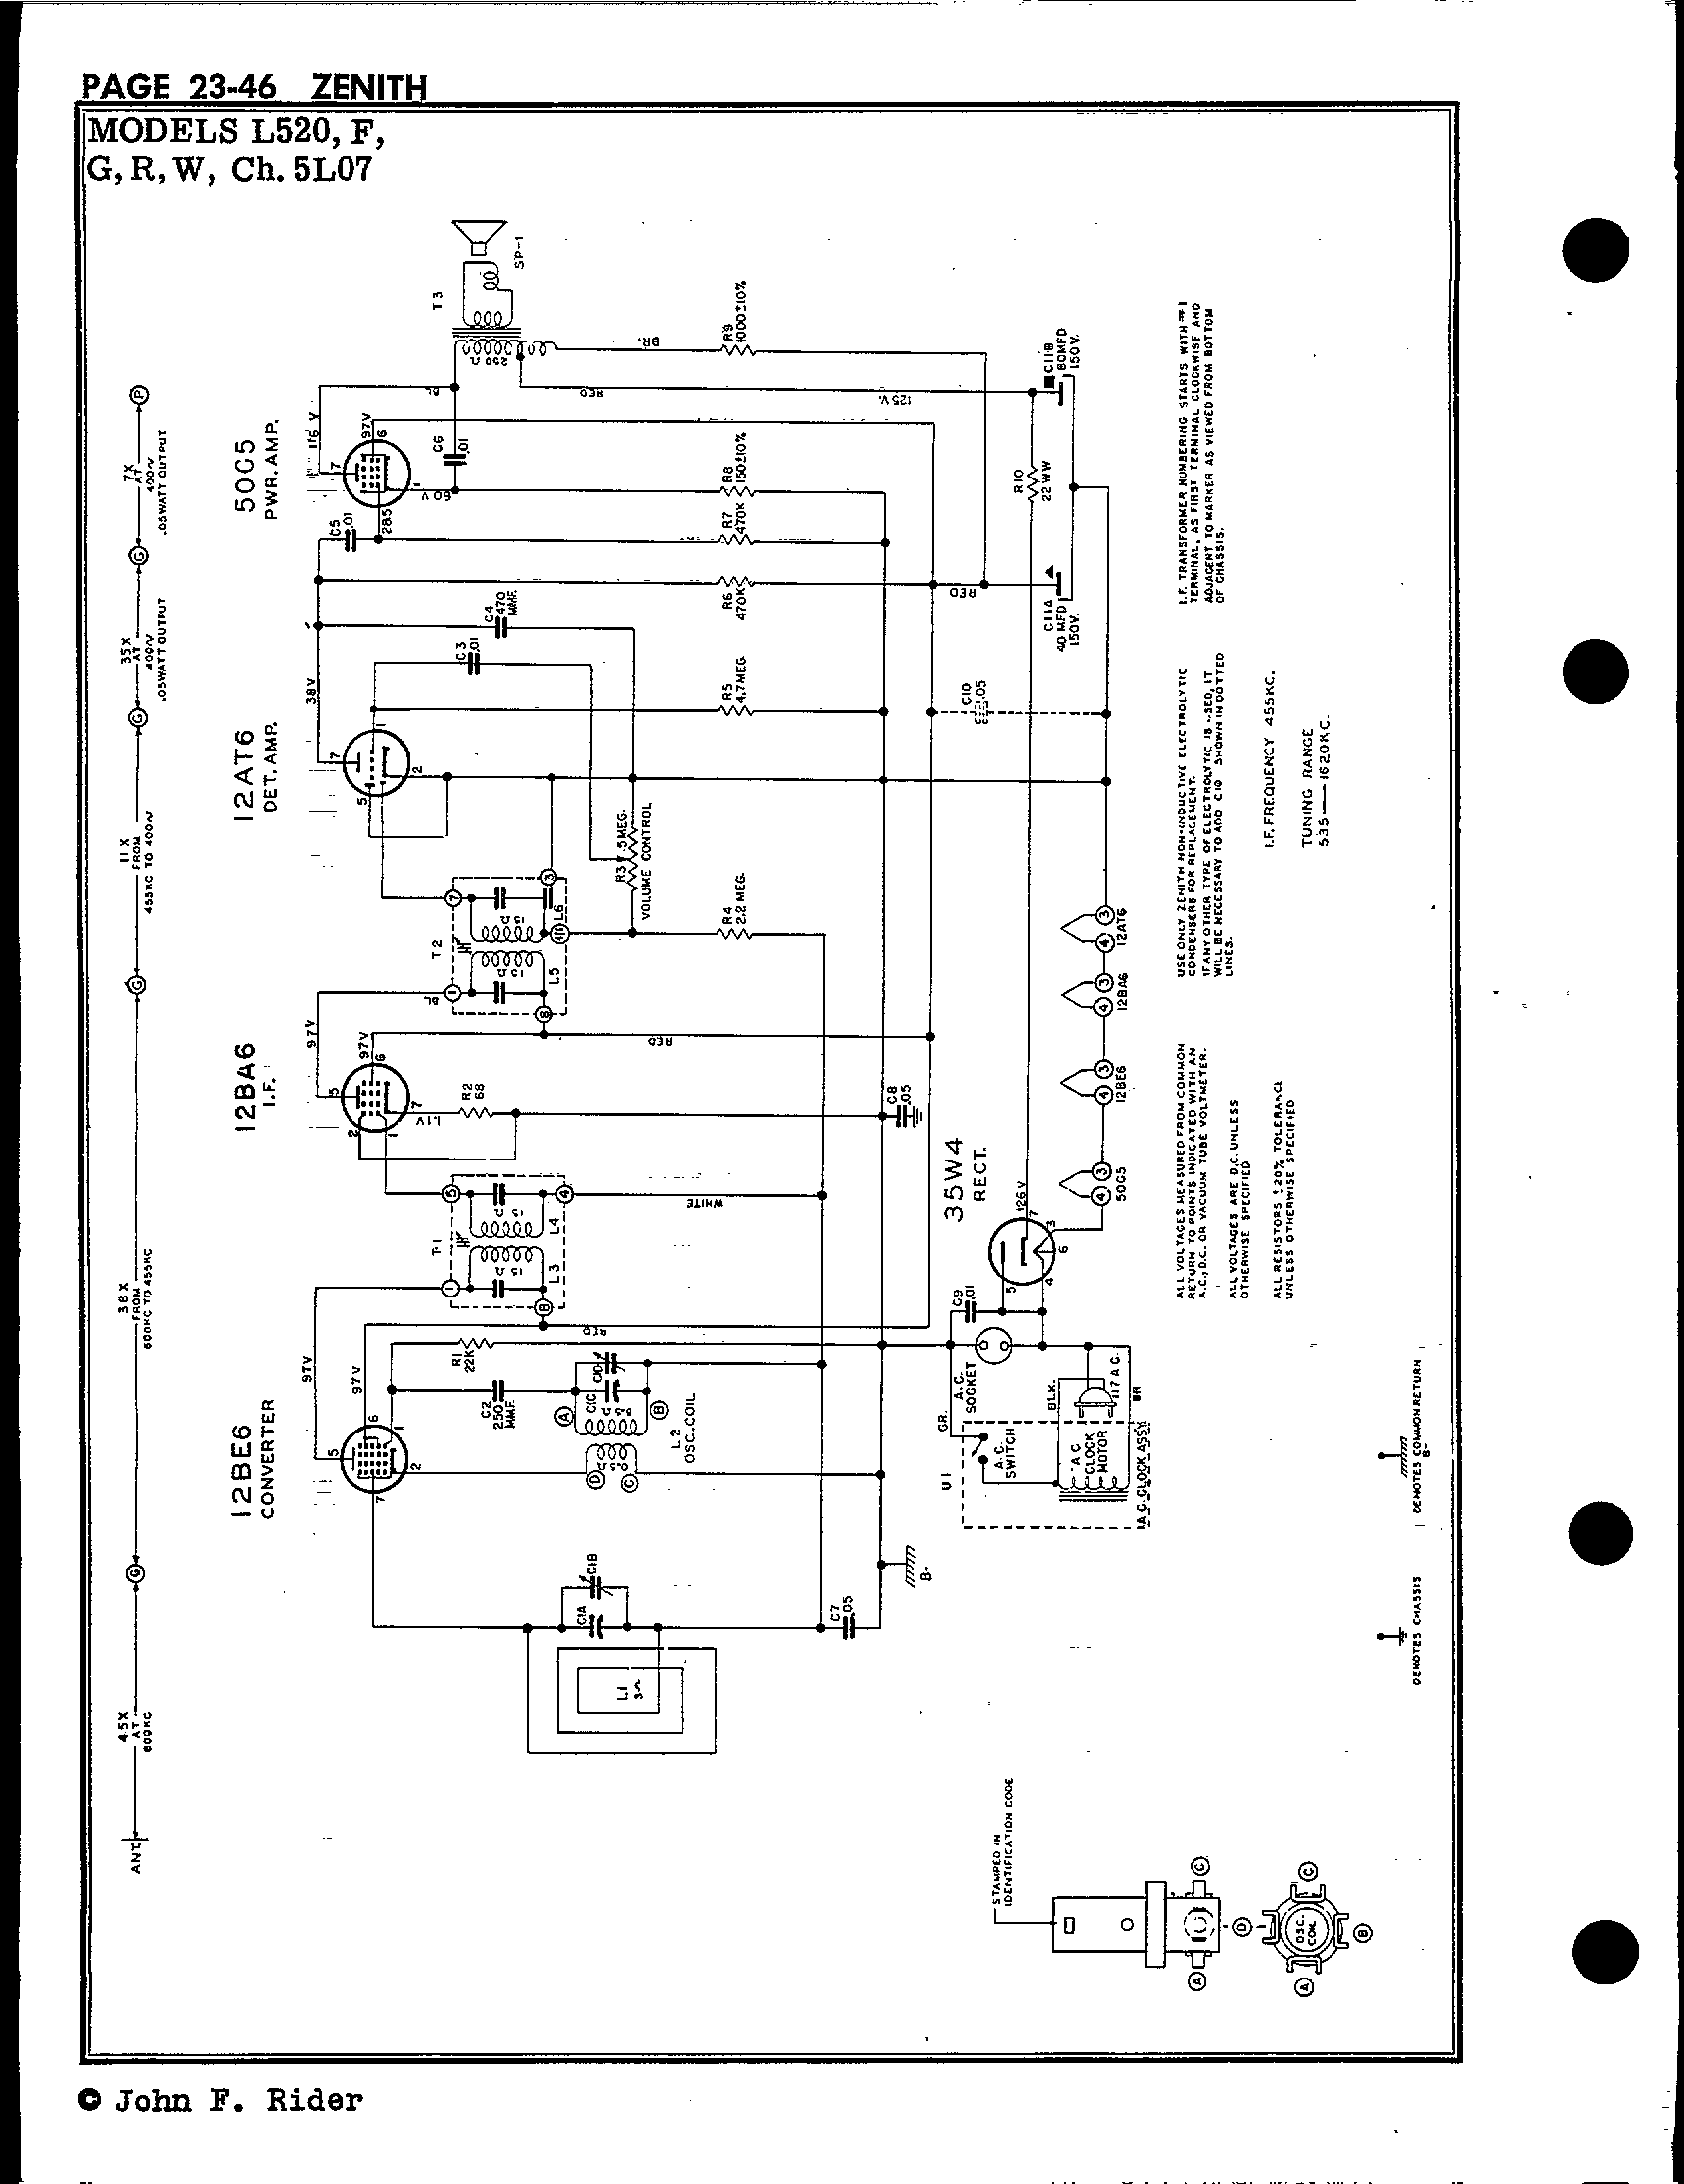 zenith tube radio schematics wiring diagram database Zenith Transistor Radio zenith radio corp l520 antique electronic supply all american 5 tube radio schematics page 2 39